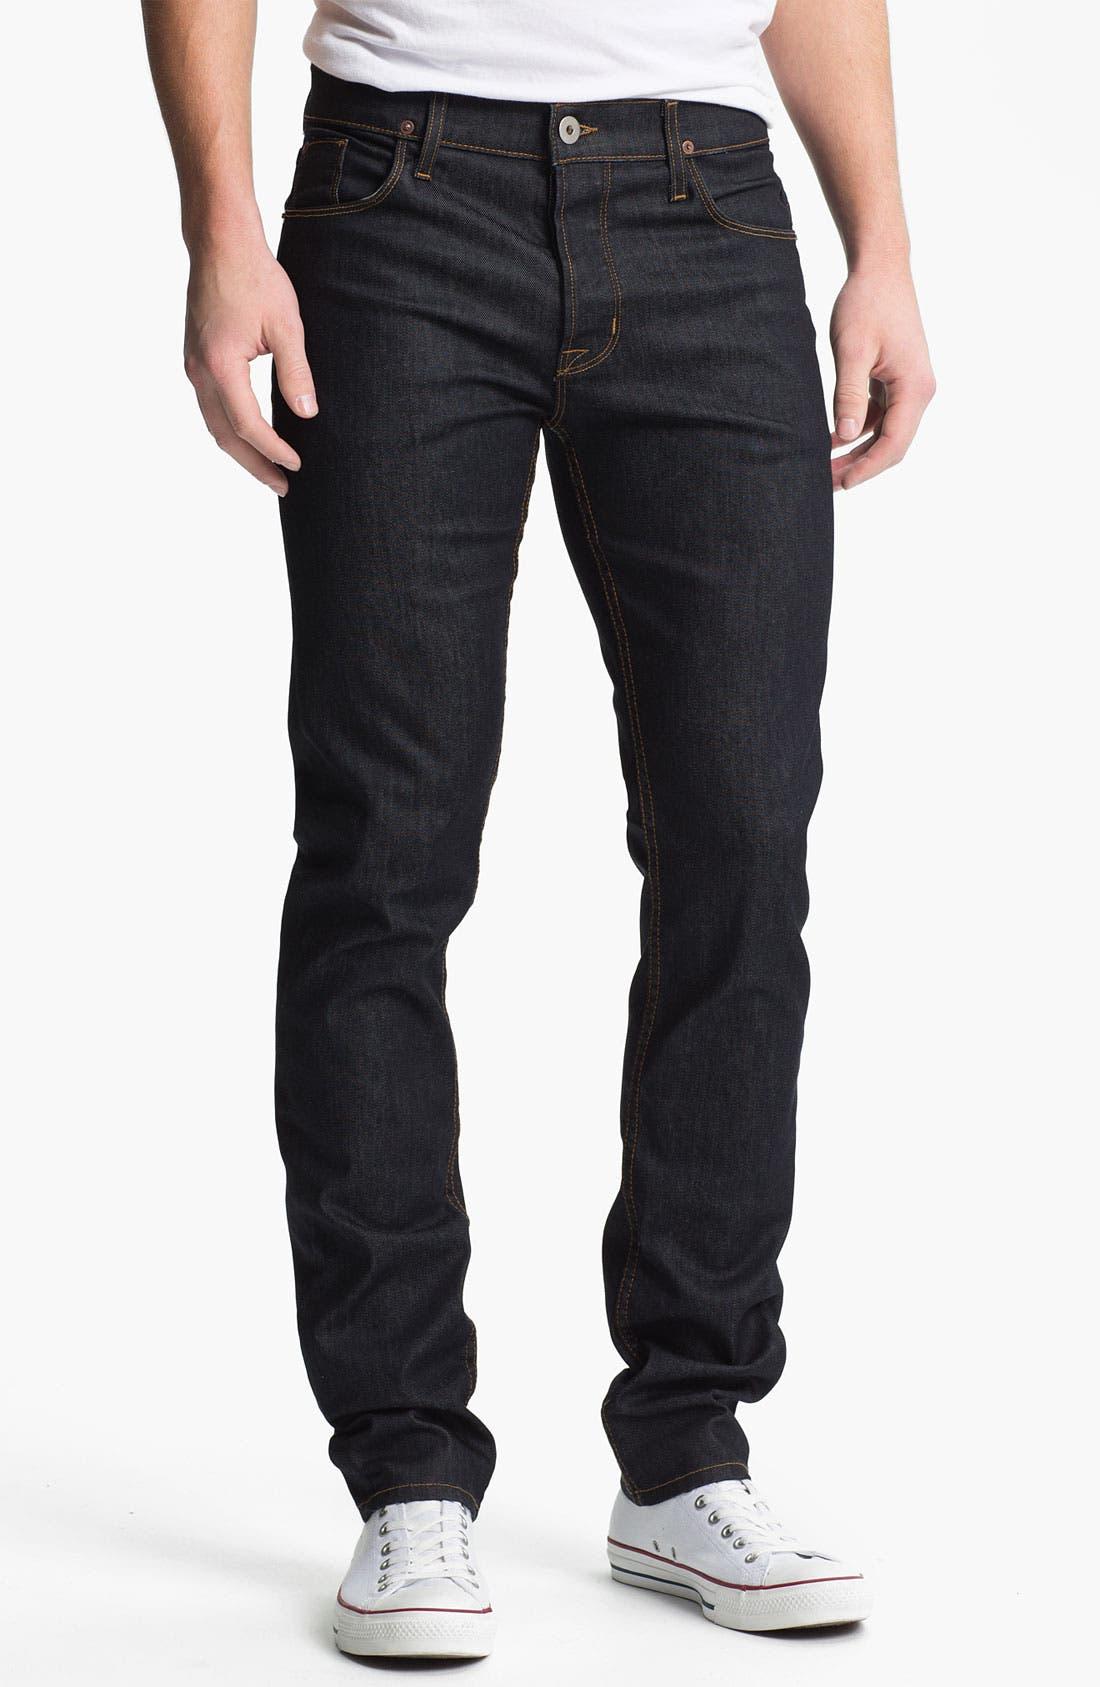 Alternate Image 1 Selected - Hudson Jeans 'Sartor' Skinny Fit Jeans (Edges)